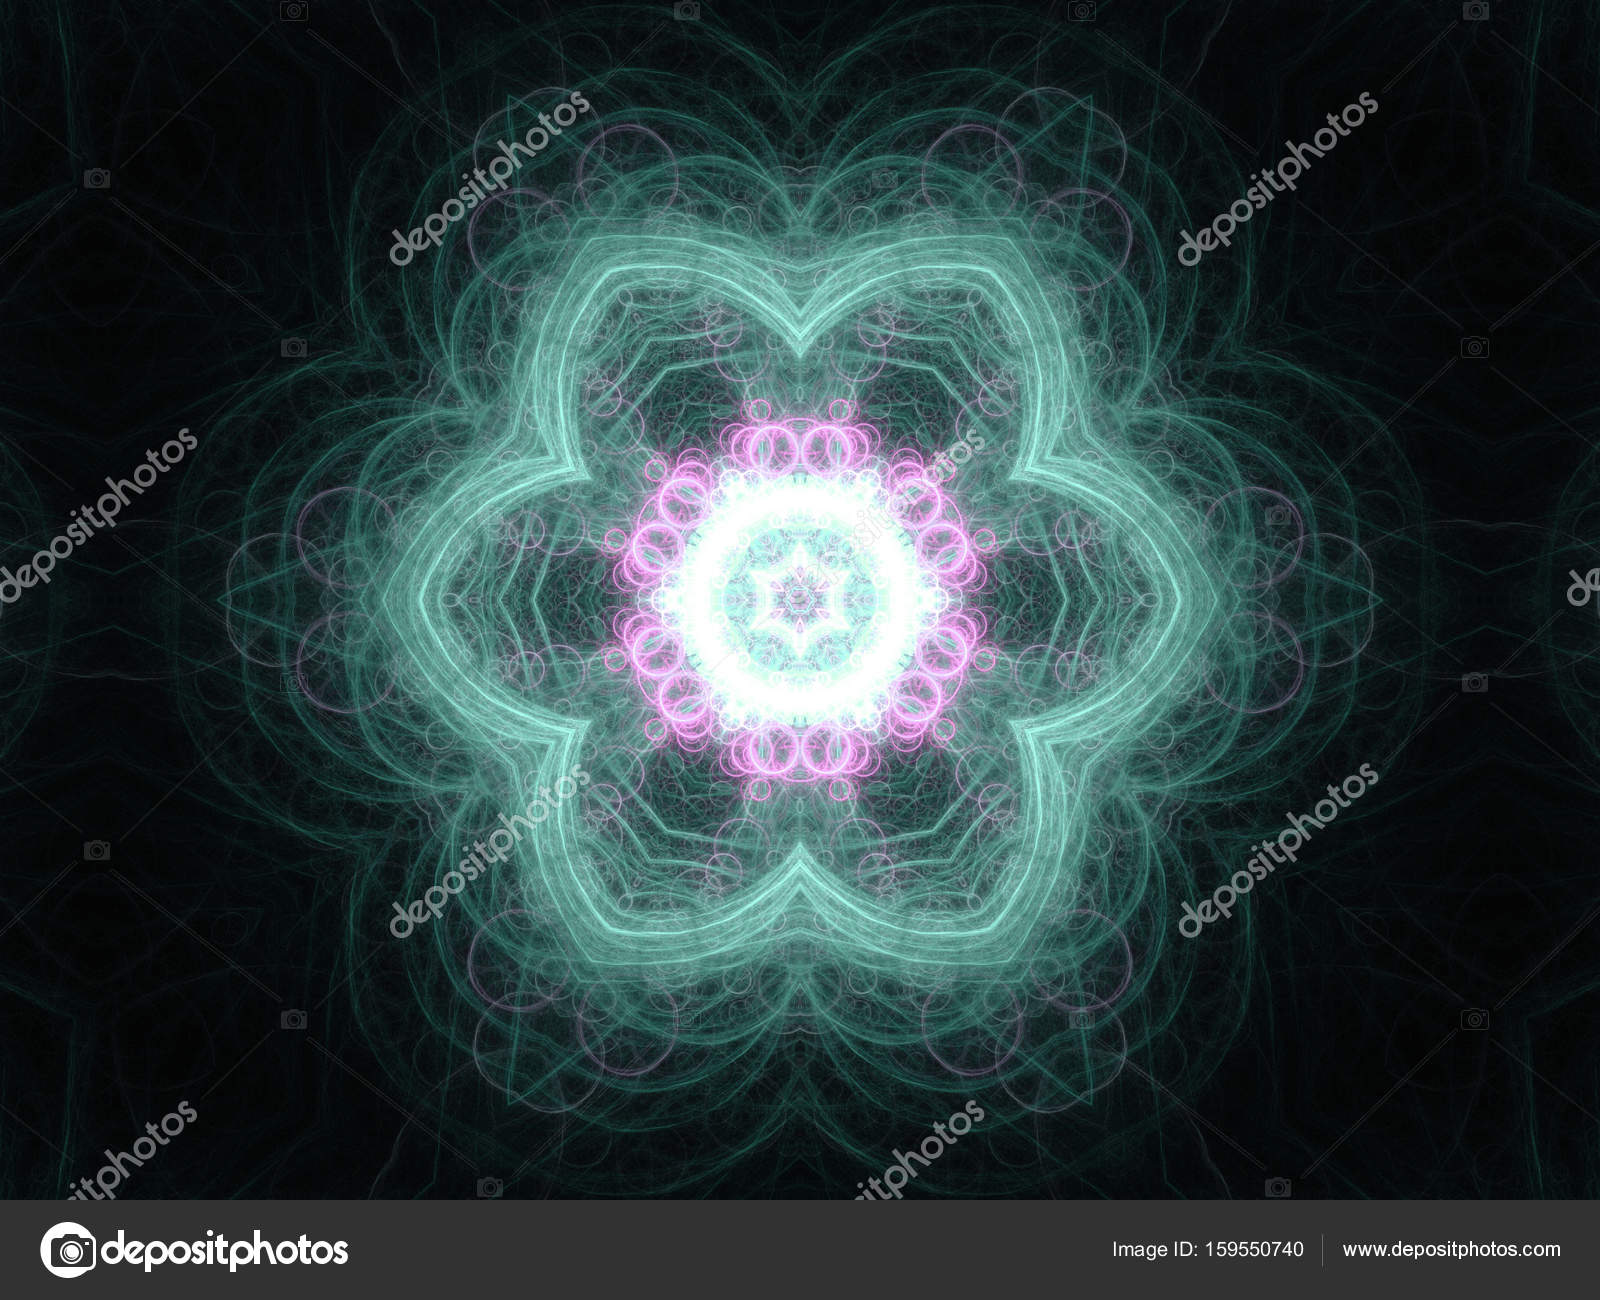 Blume geformt Fraktale Mandala, digital Artwork für kreative ...